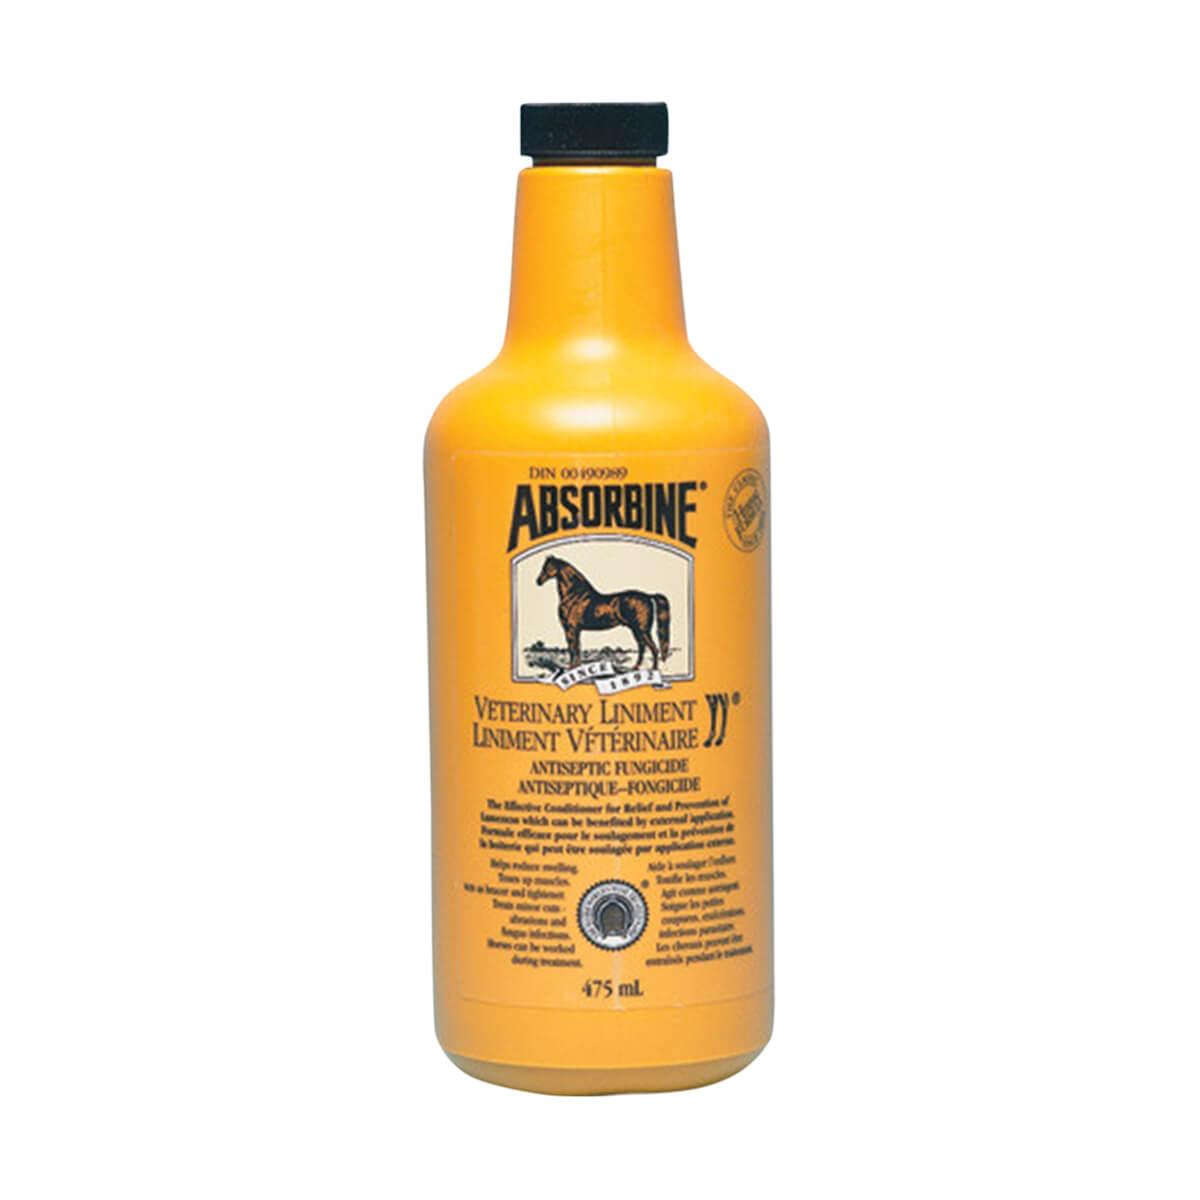 Veterinary Liniment - 475 ml